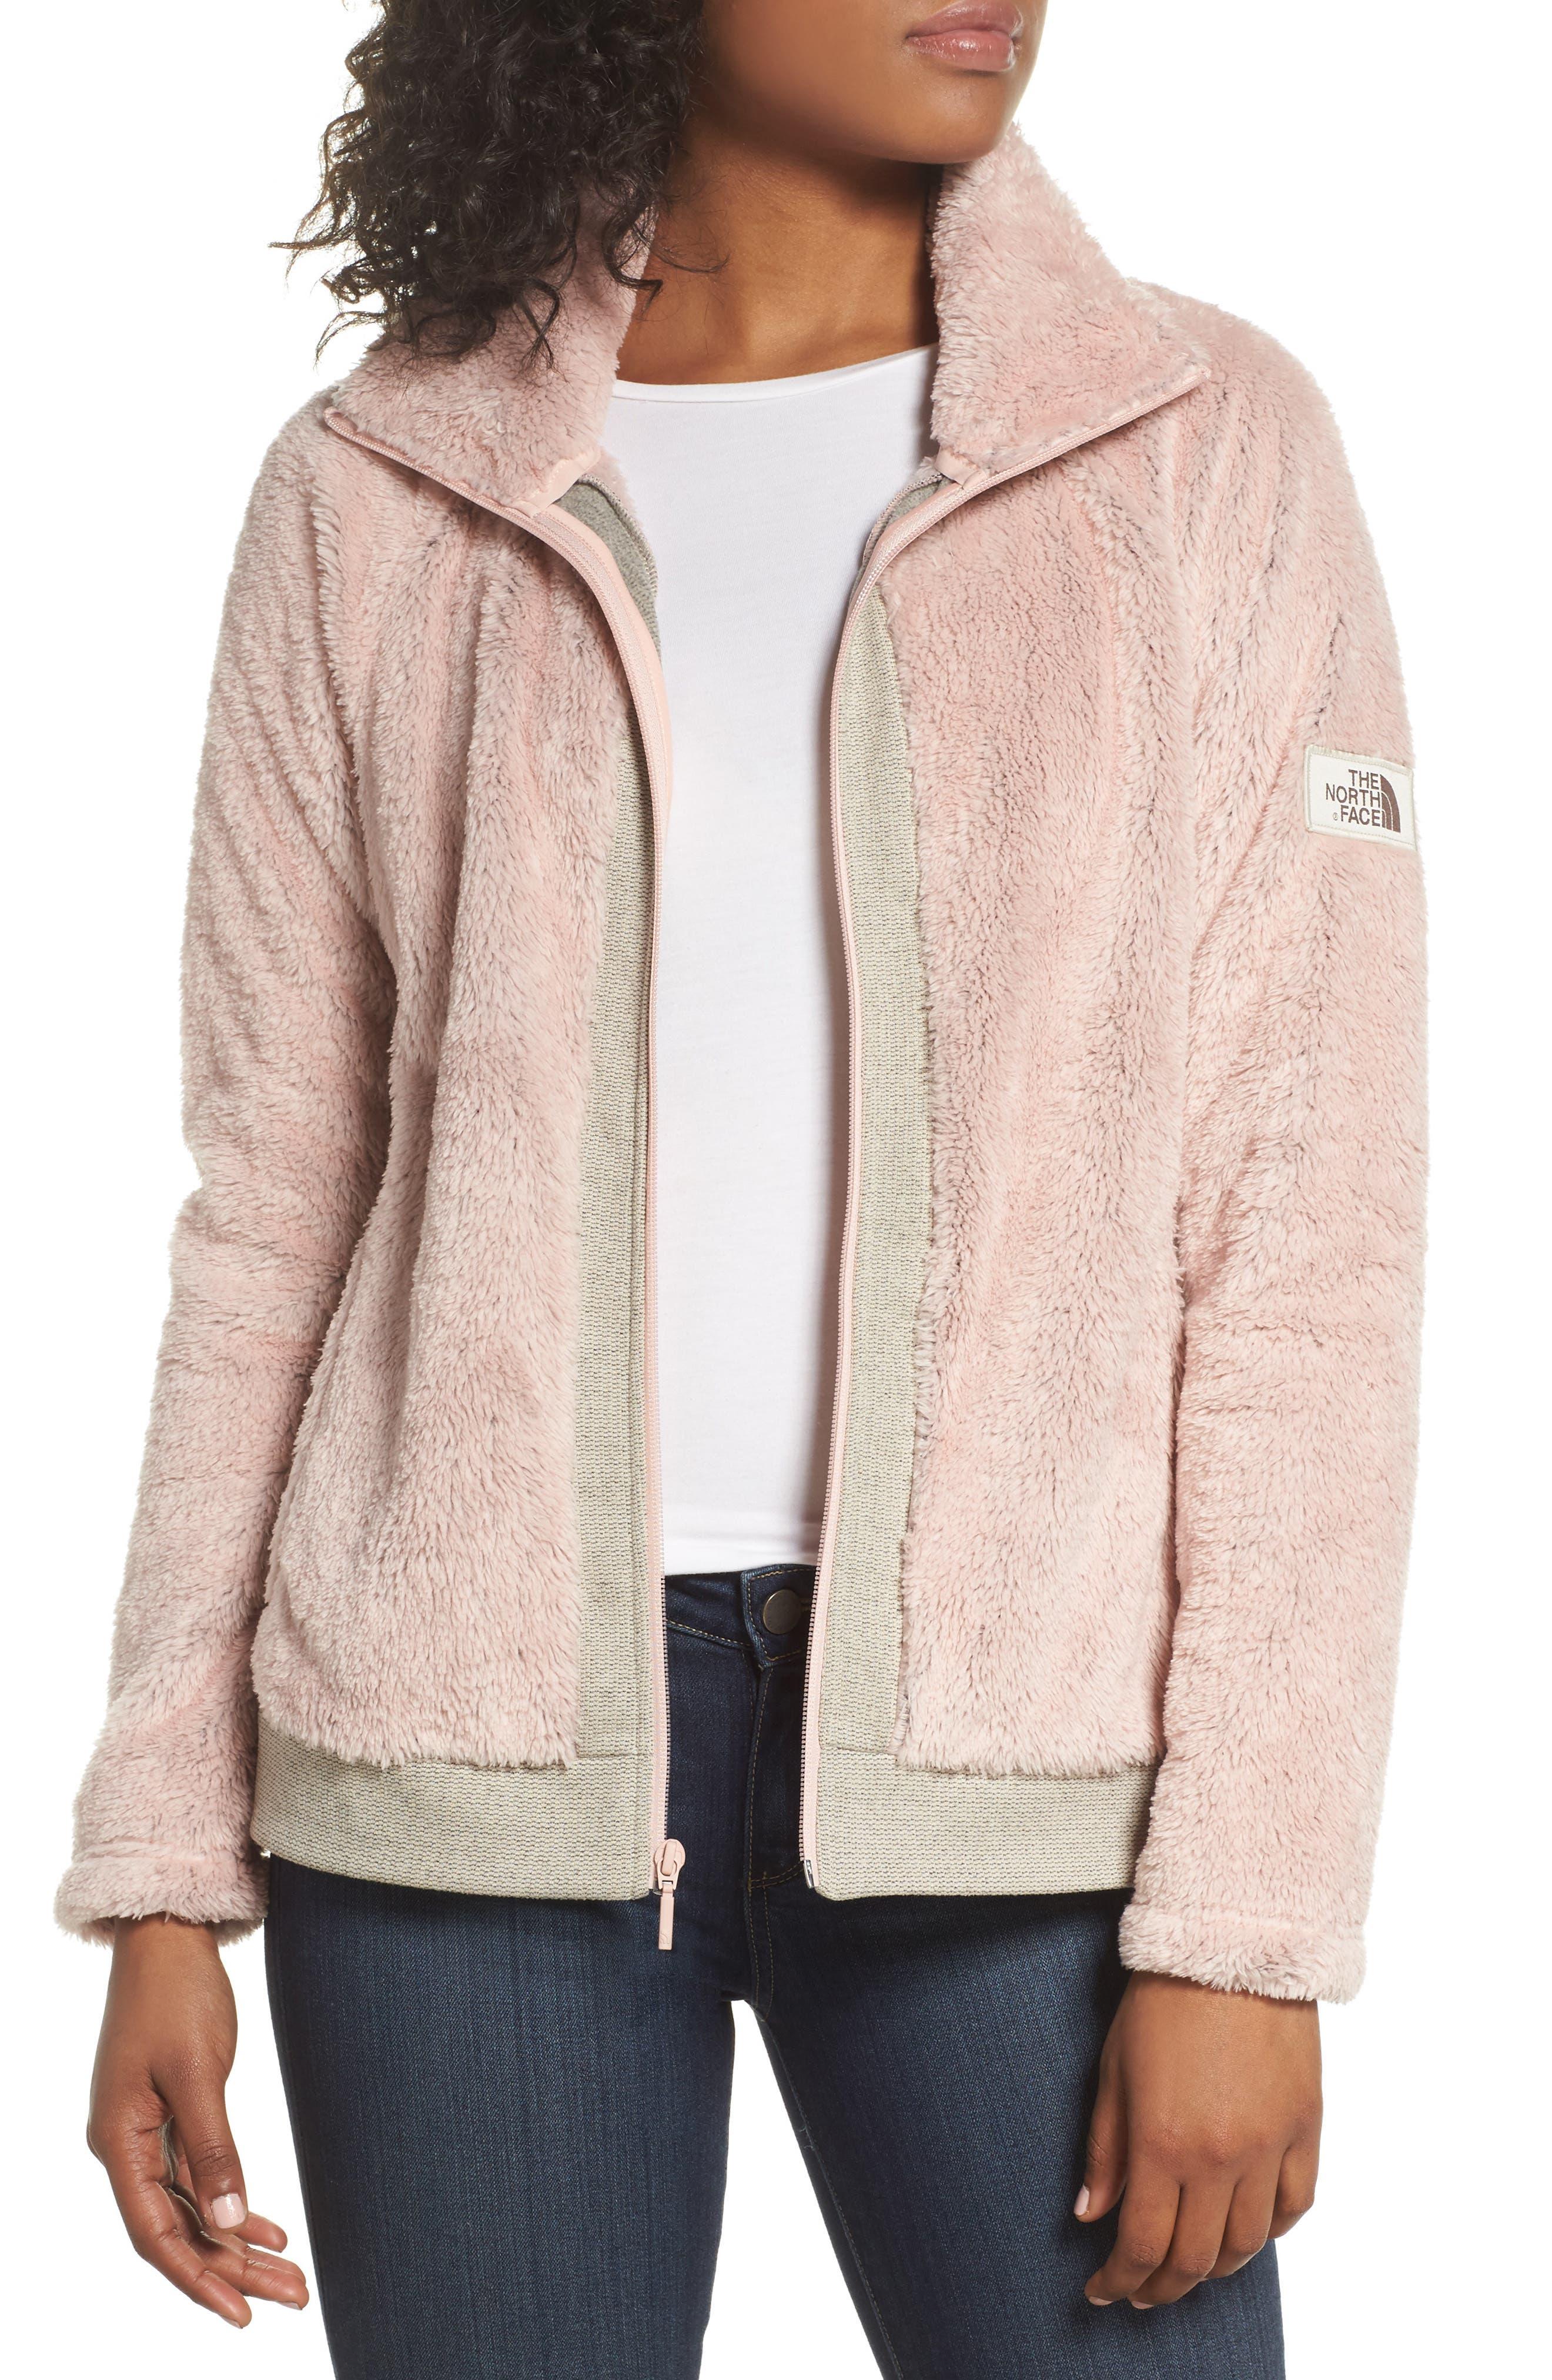 Furry Fleece Jacket,                             Main thumbnail 1, color,                             Evening Sand Pink